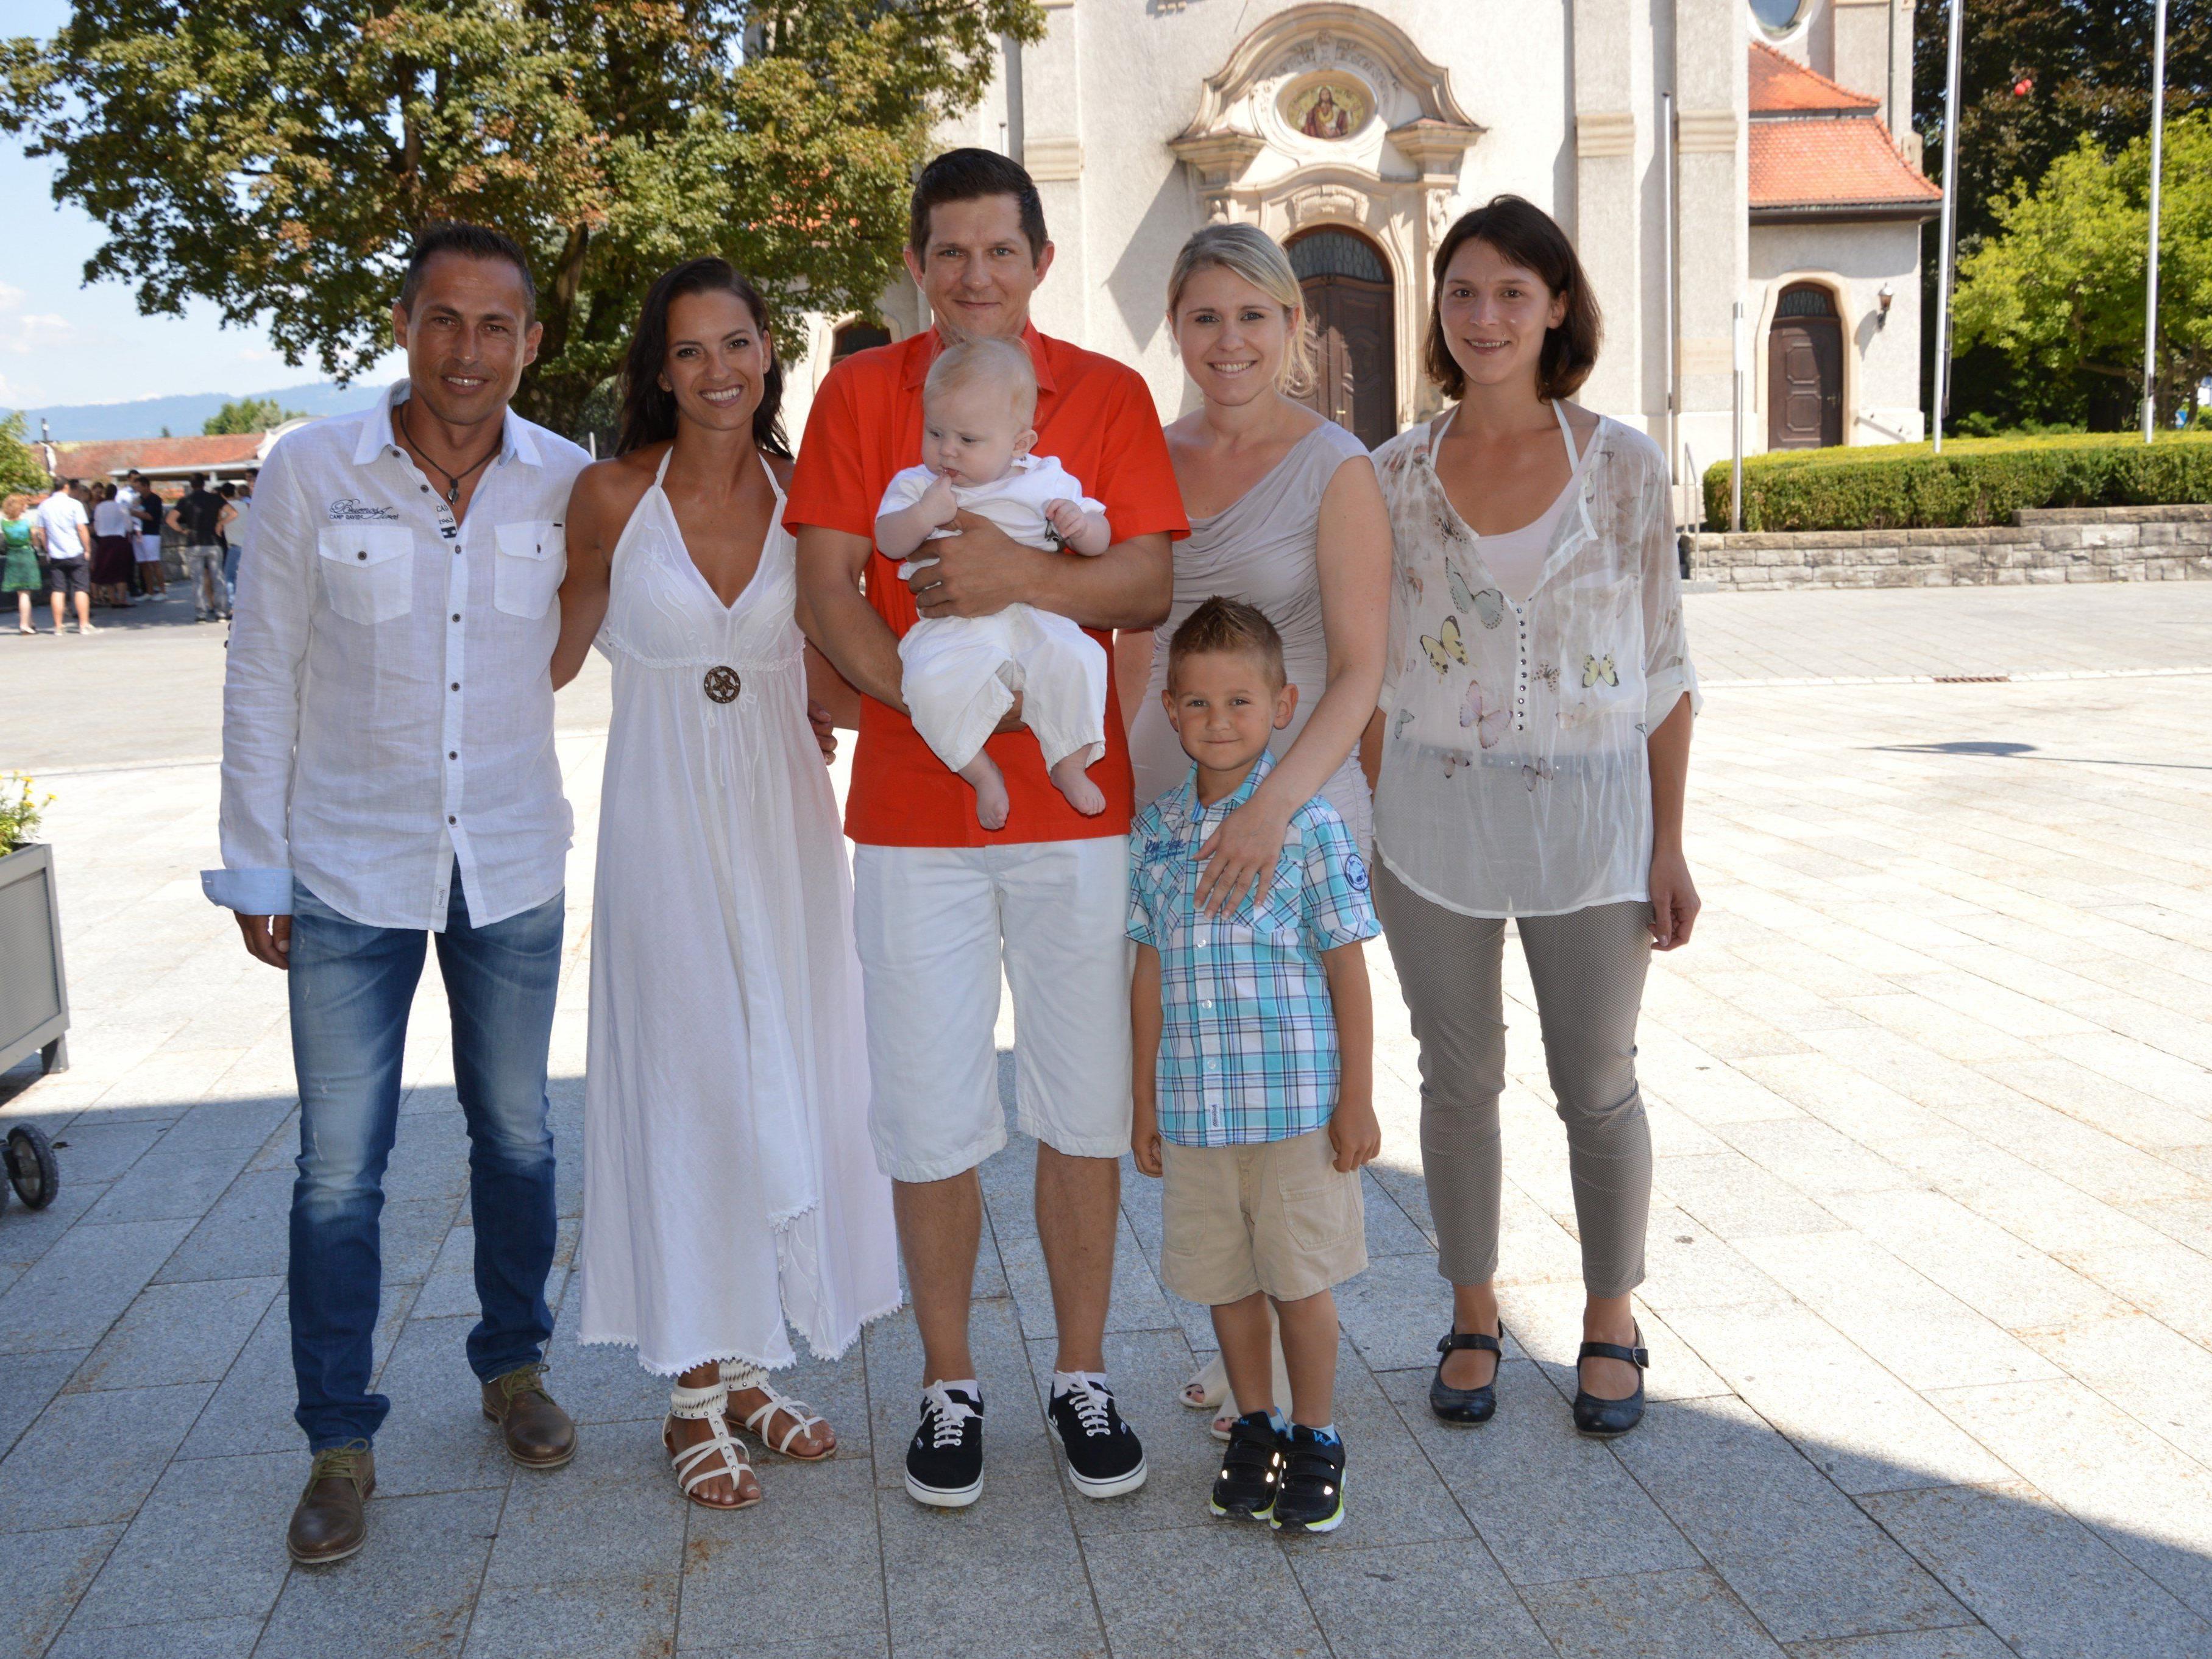 Tiago Carli empfing die Taufe